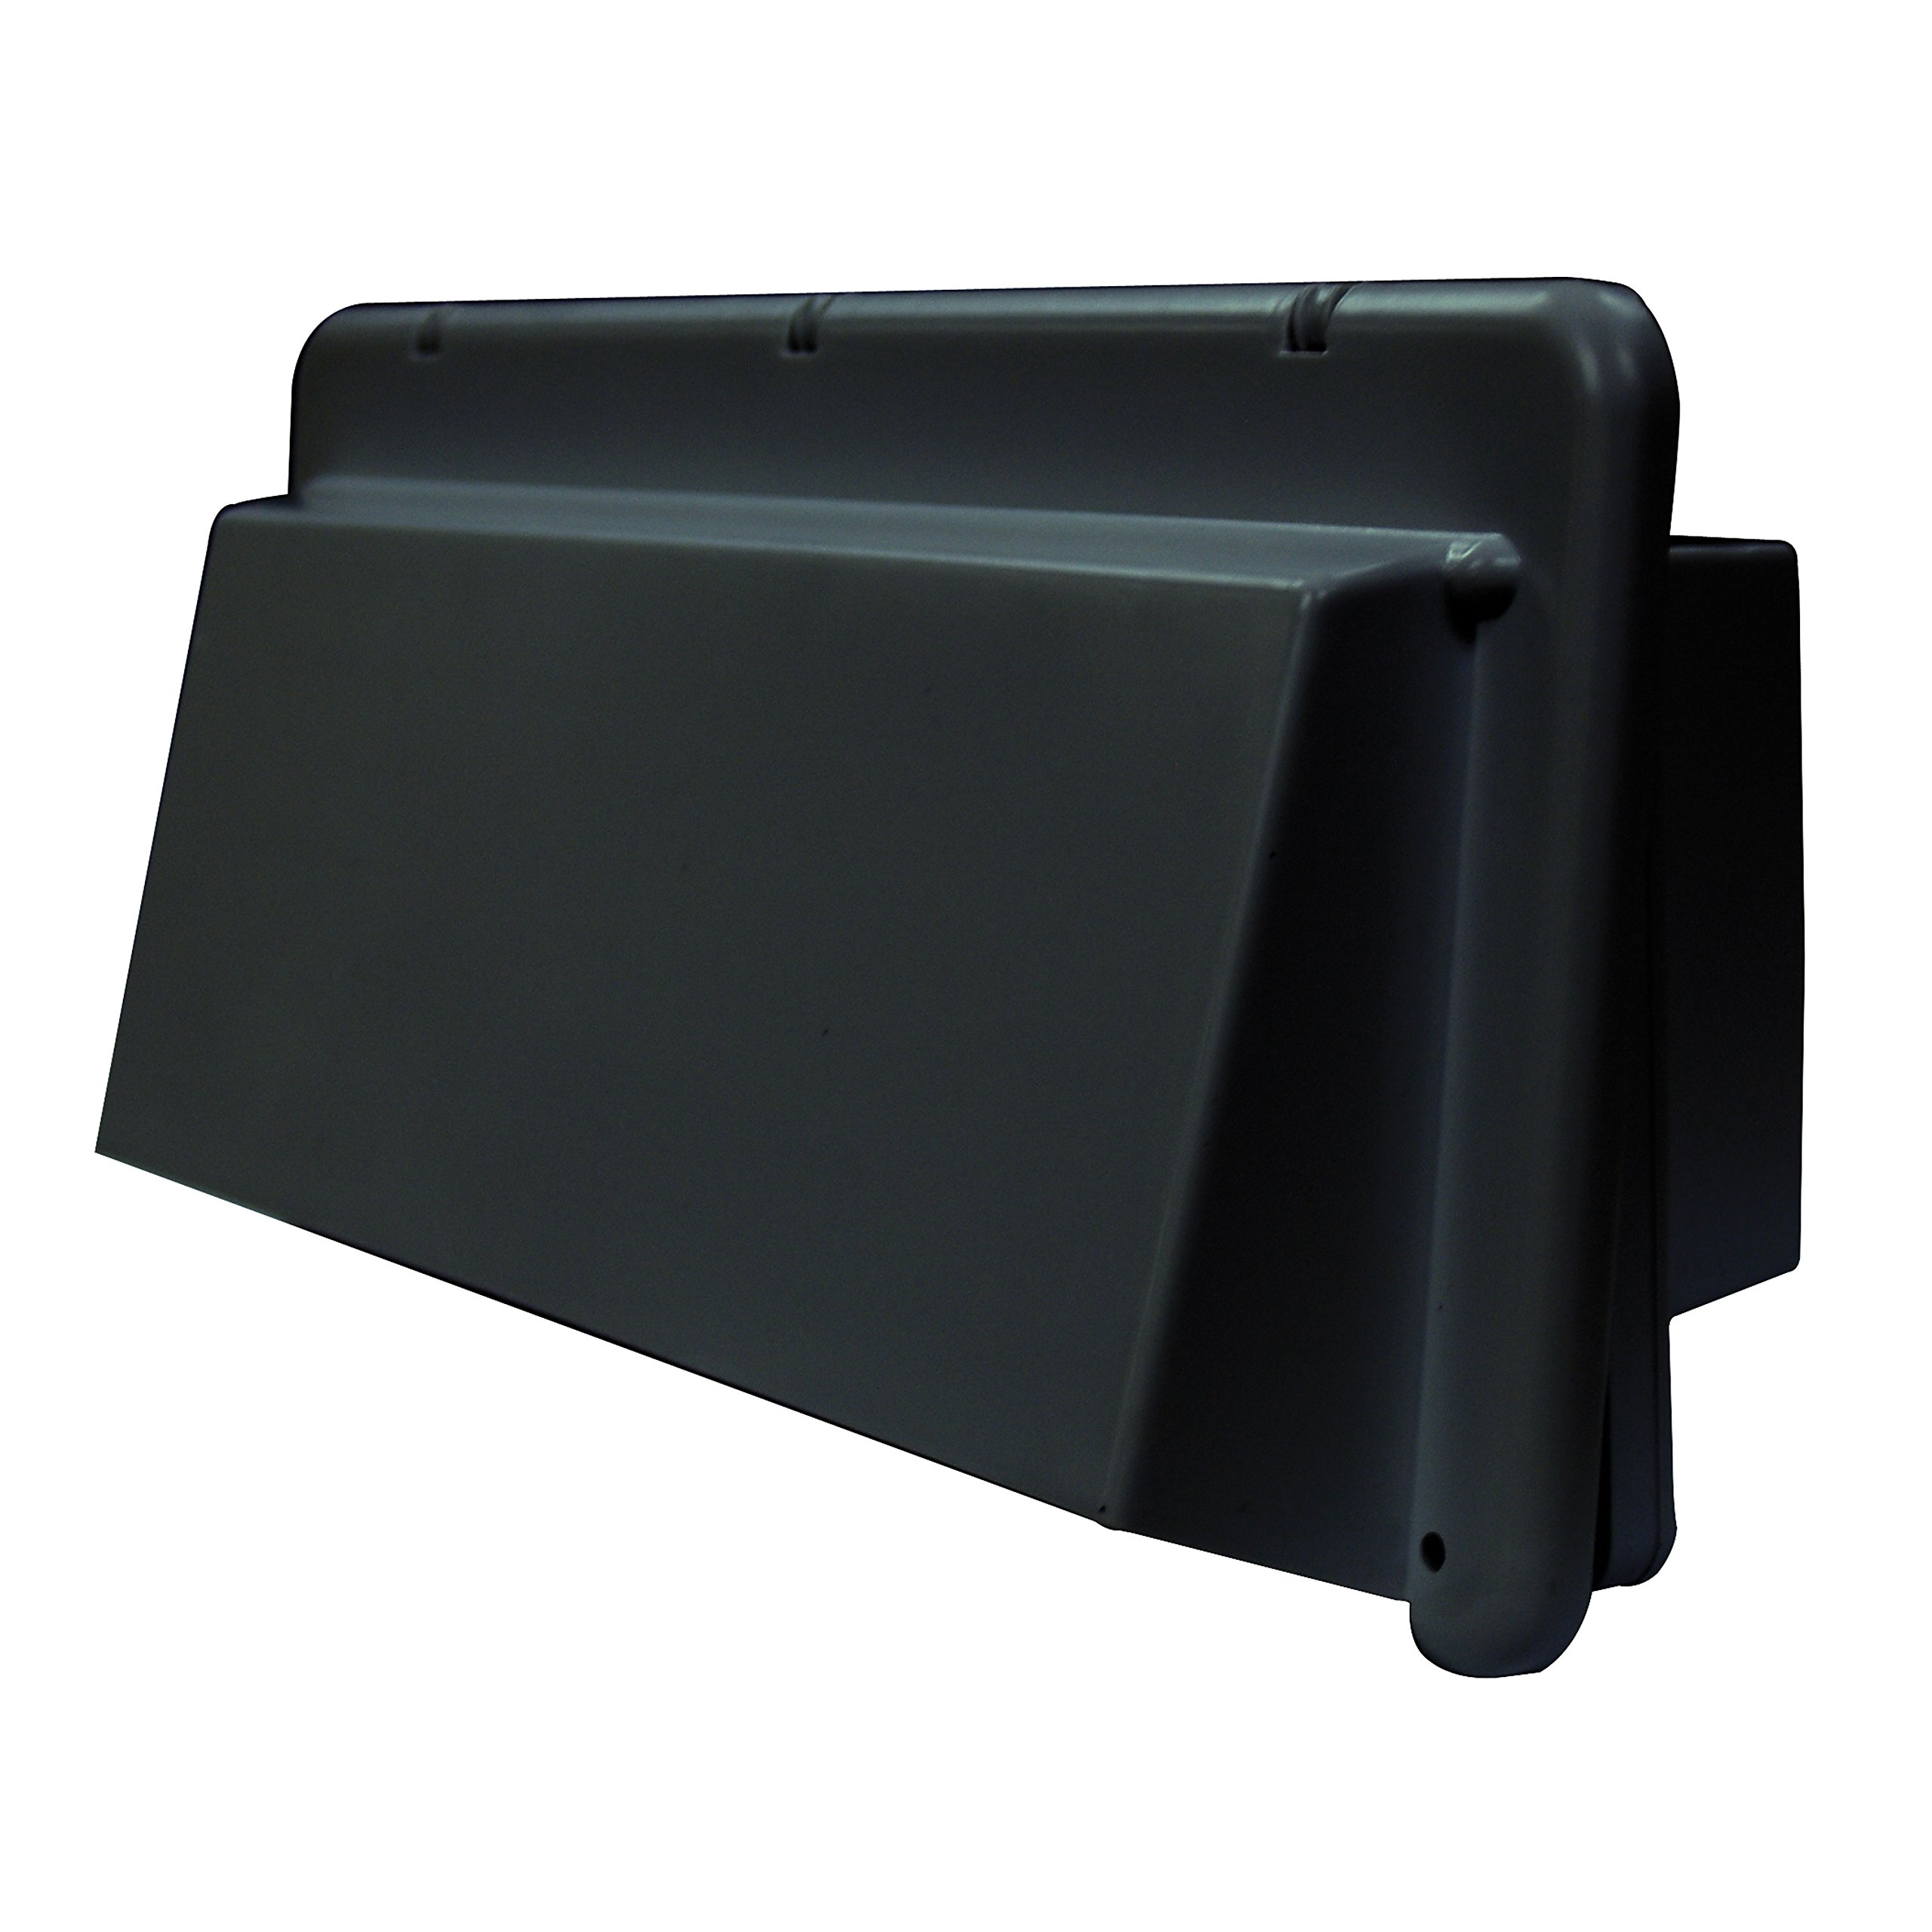 Heng's J116BK-C Range Vent Exhaust Cover - Black by Heng's